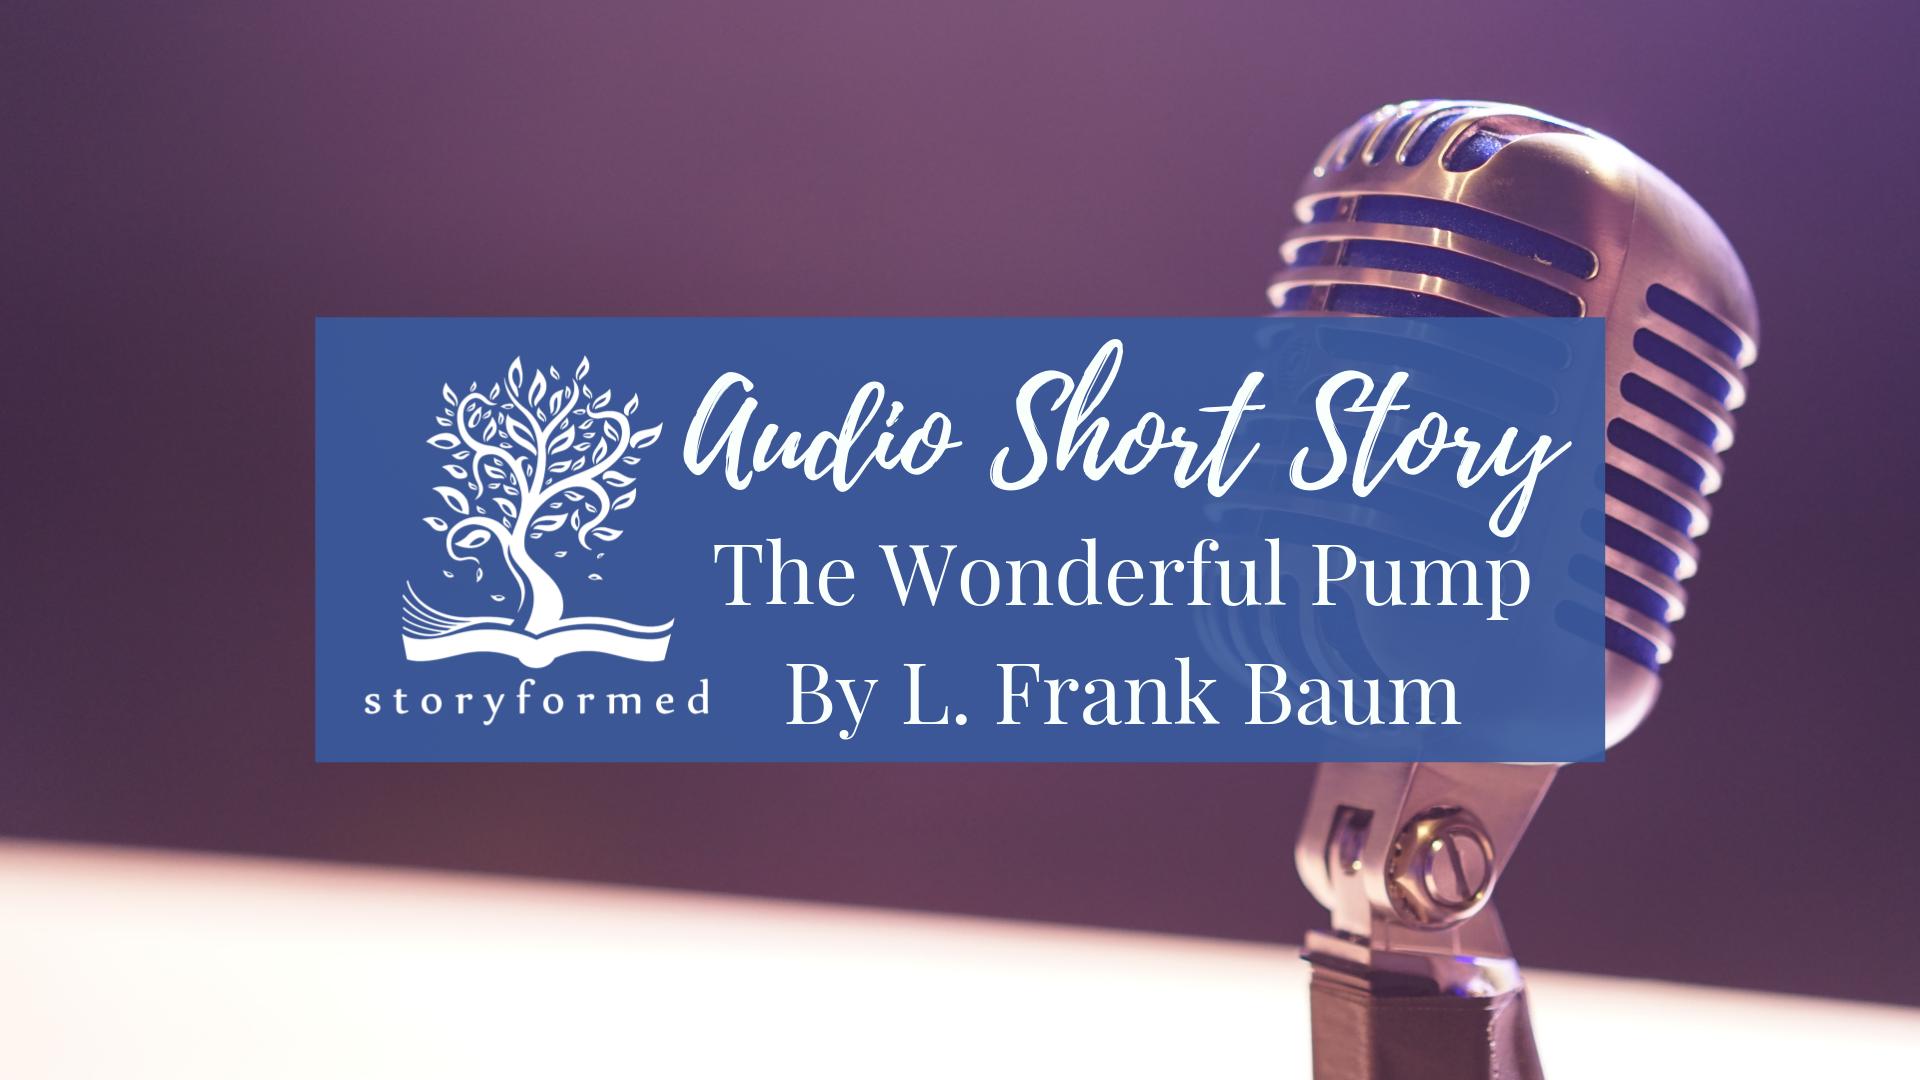 LWS Storyformed Audio Short Story Baum.png